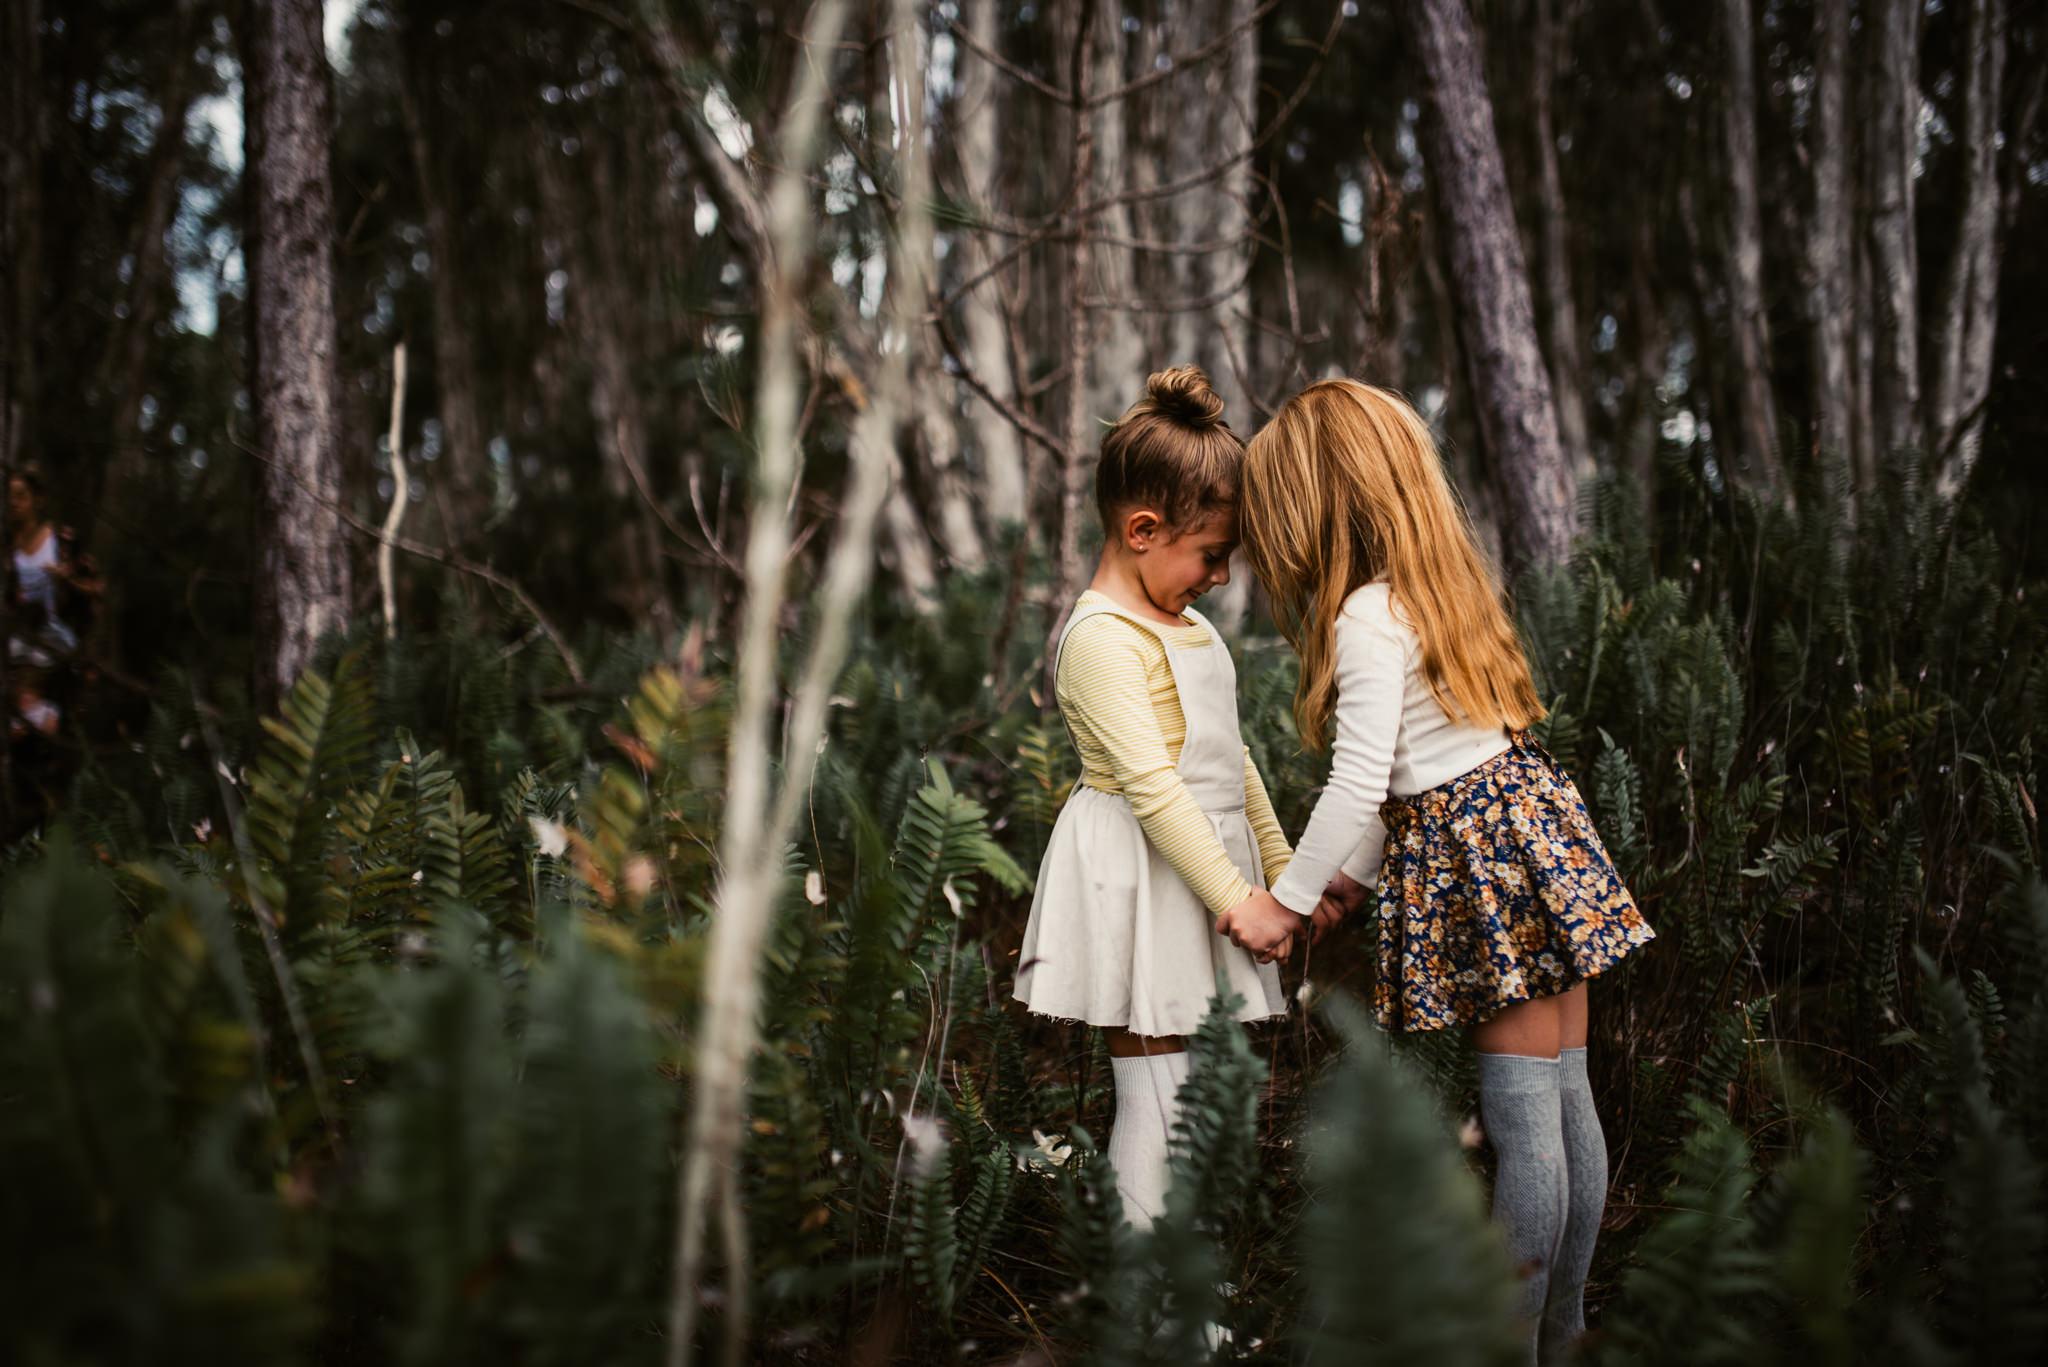 twyla jones photography - treasure coast florida - childrens adventure clothing commercial shoot--7.jpg